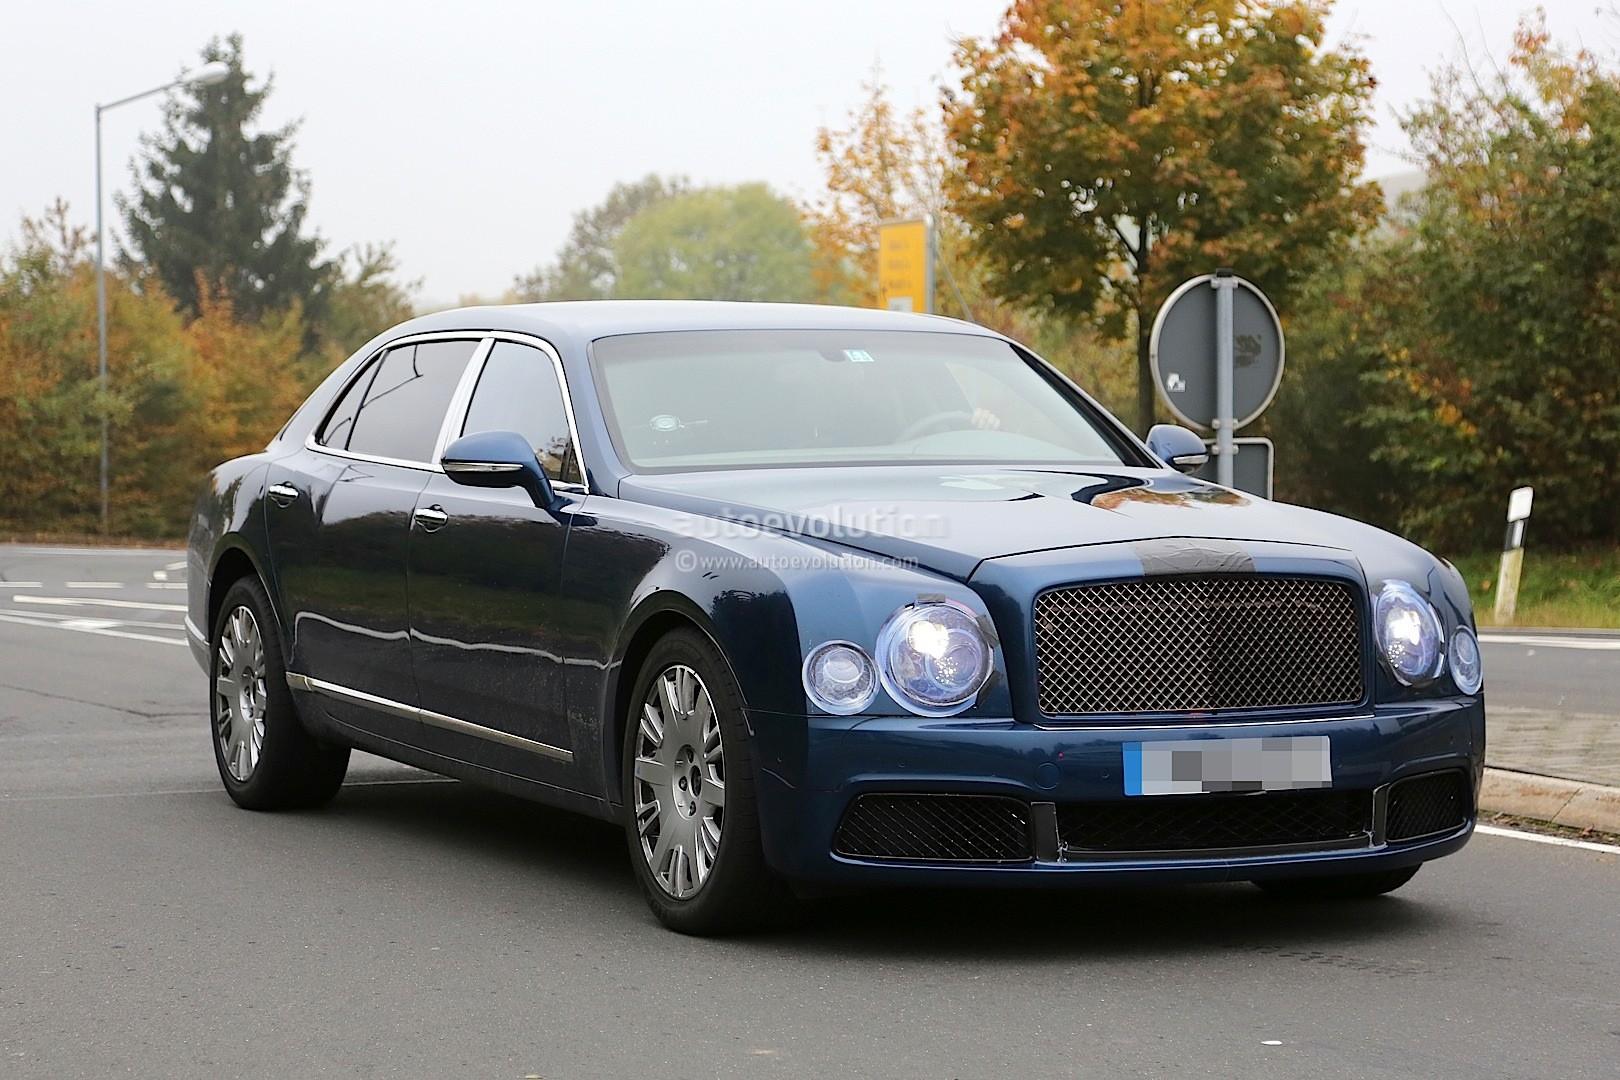 2017 Bentley Flying Spur >> 2017 Bentley Mulsanne Spyshots Reveal Long Wheelbase Model, Arnage-like Front Bumper - autoevolution